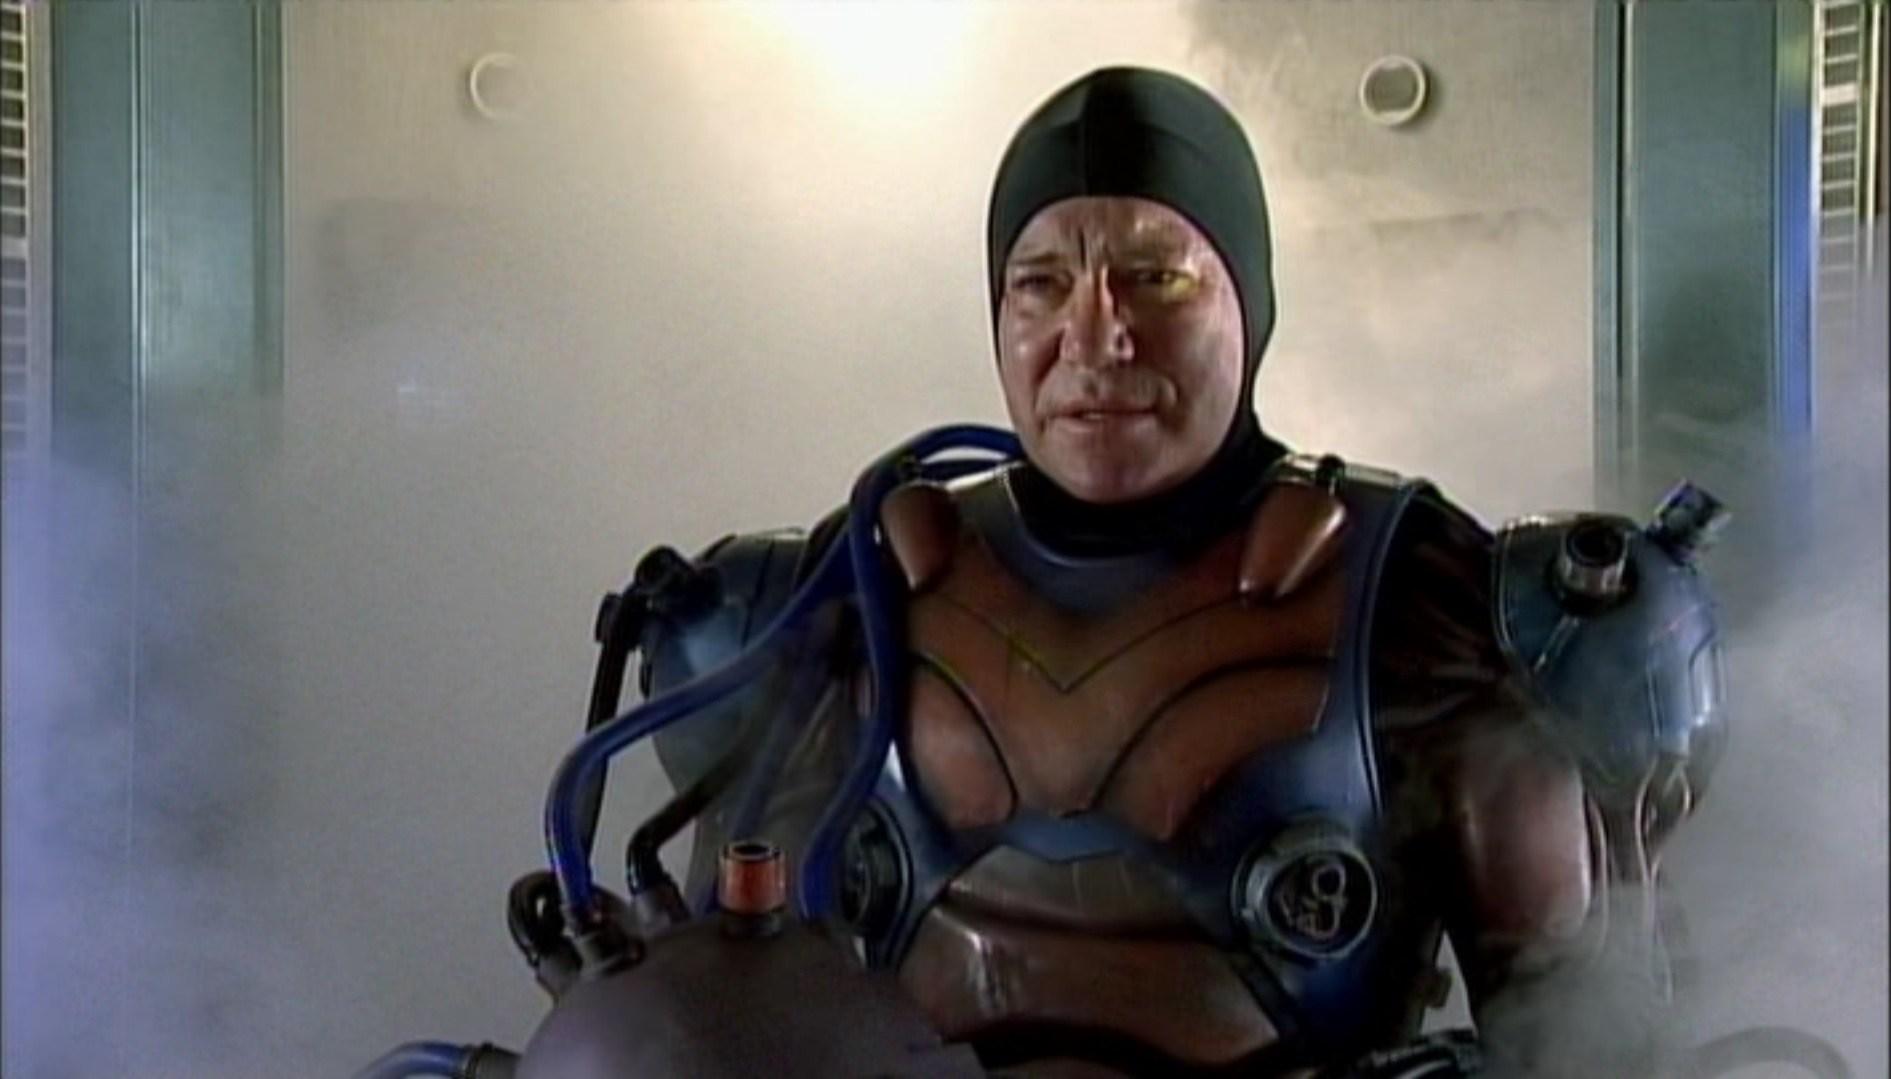 William Shatner in Groom Lake (2002)